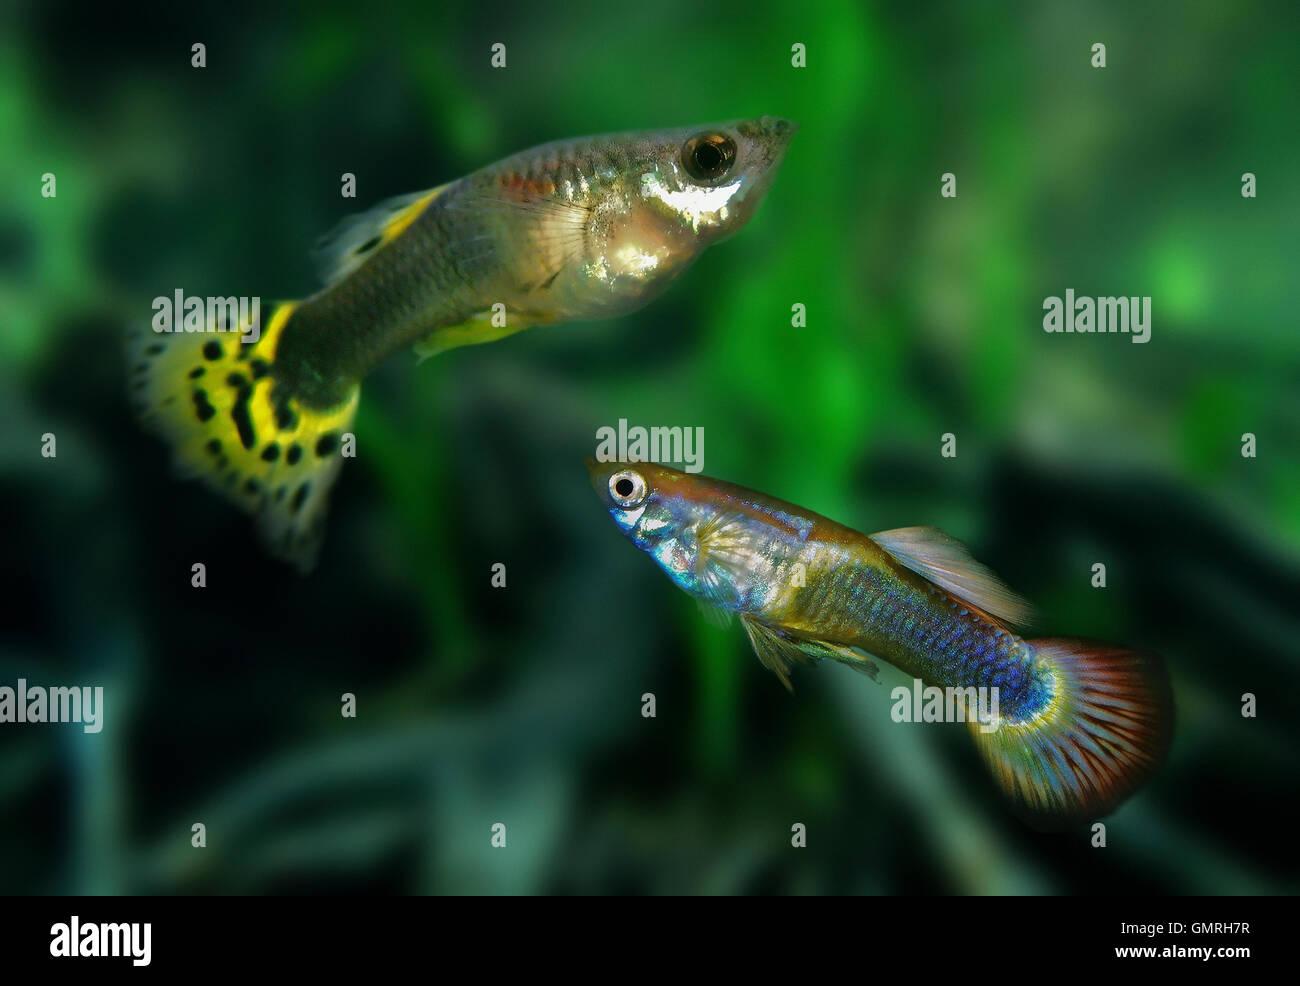 Guppy, Poecilia reticulata. Couple, male bellow. Aquarium. Portugal - Stock Image